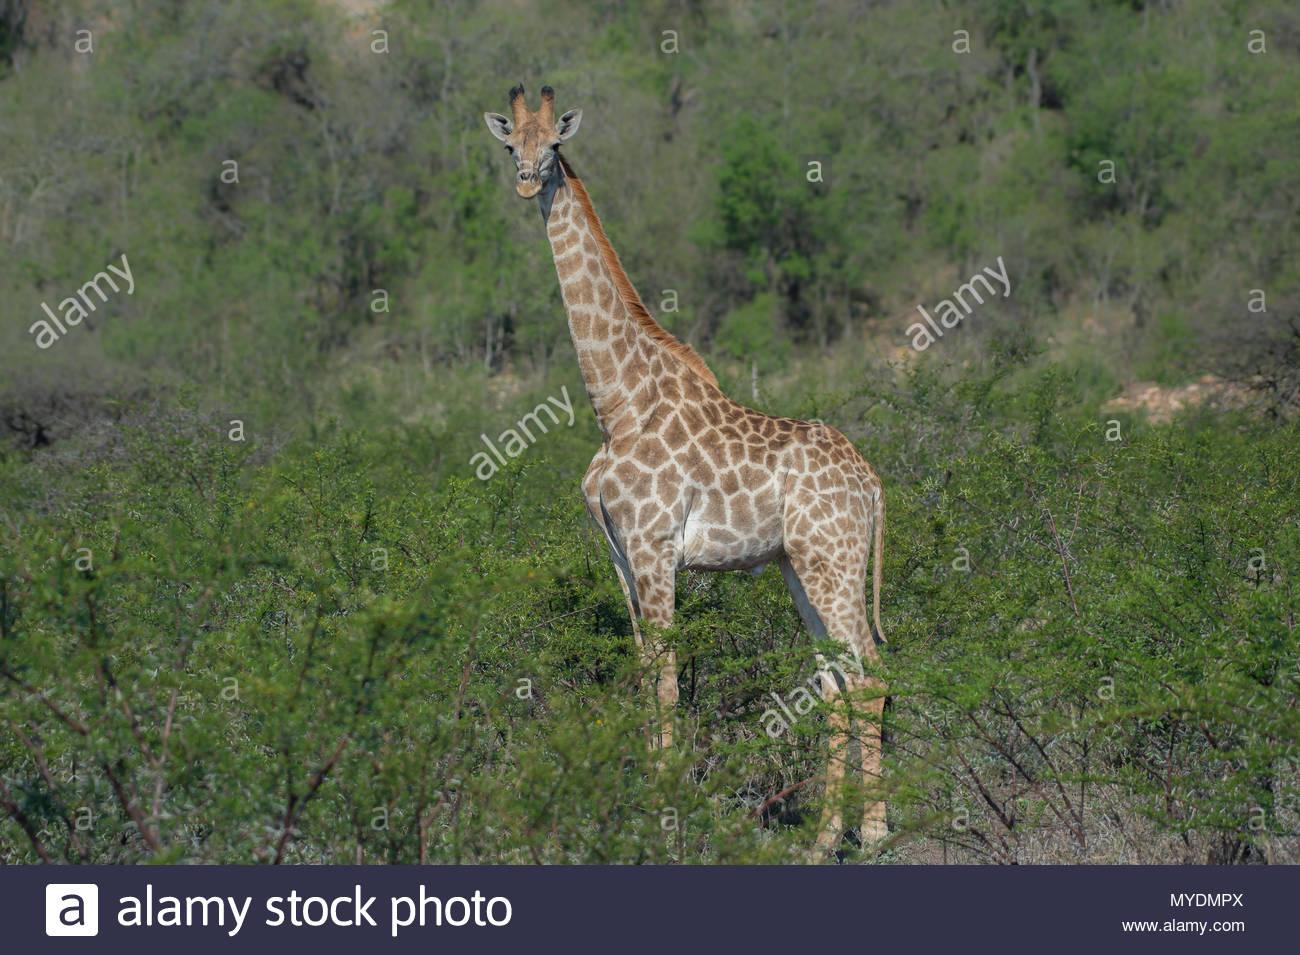 Giraffe stands tall among shrubbery. - Stock Image